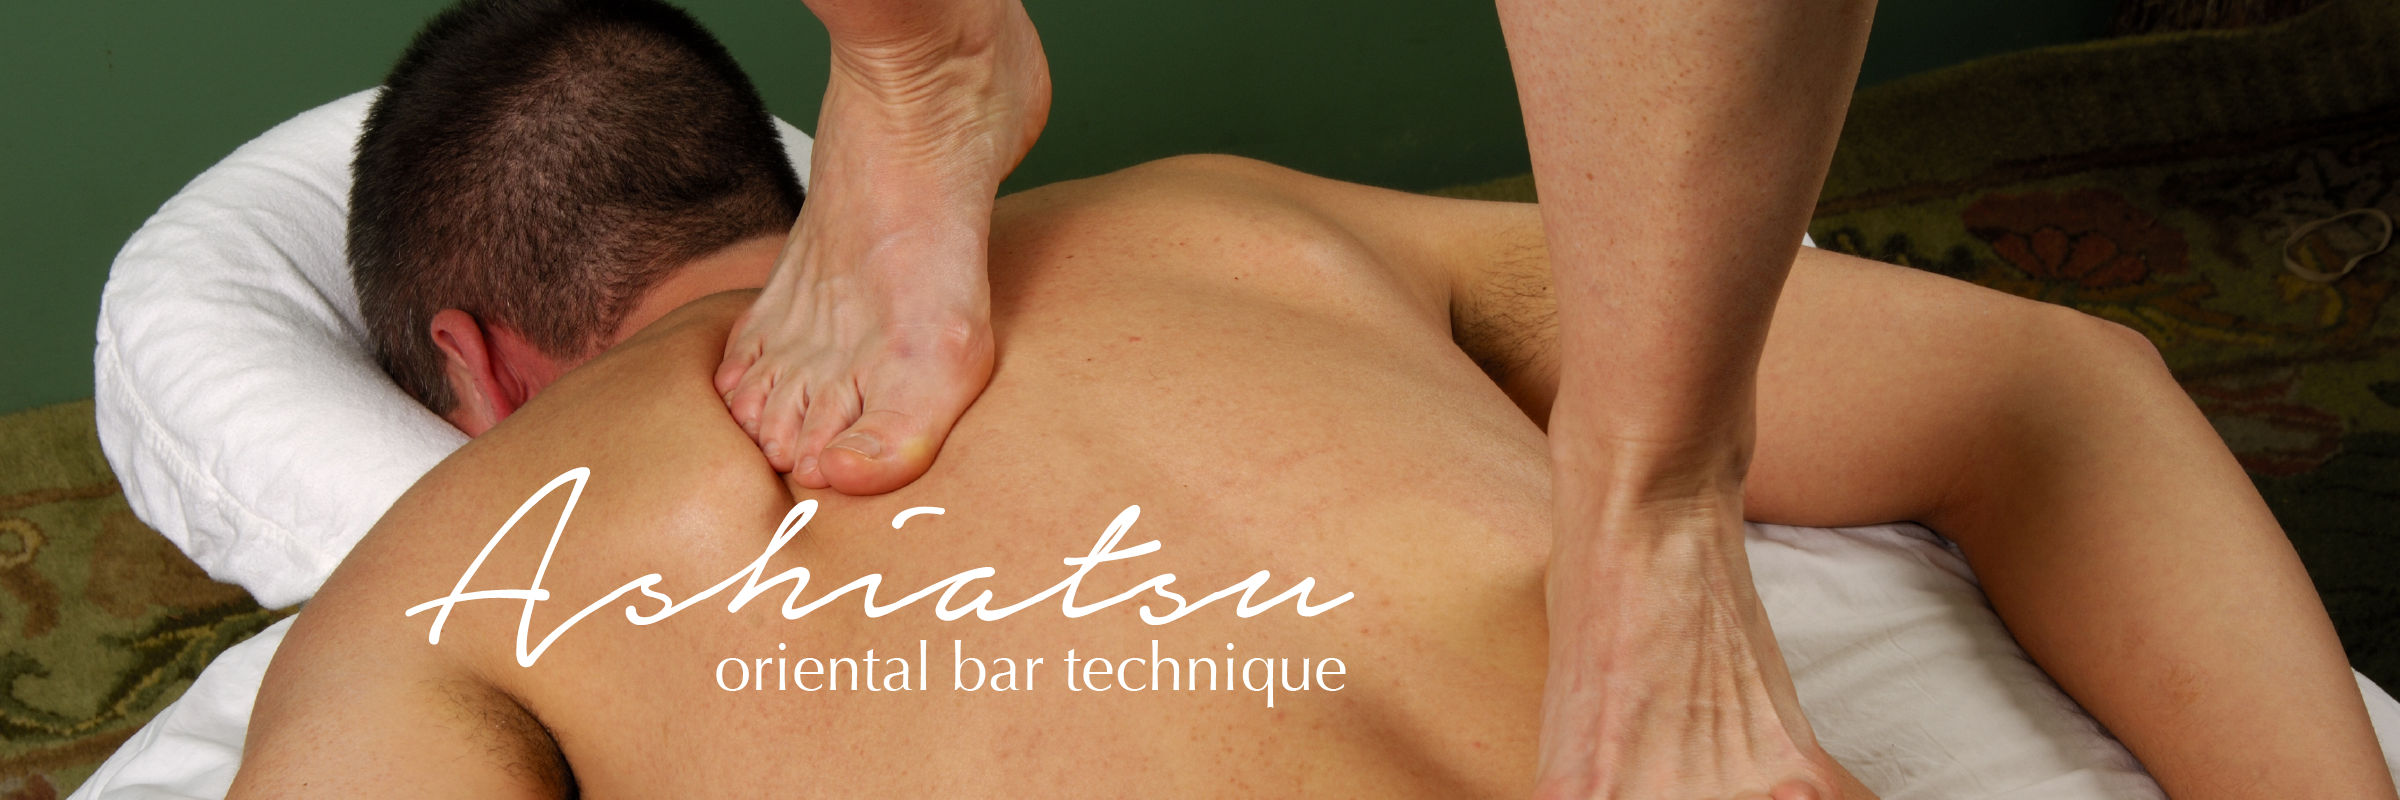 Ashiatsu Oriental Bar Therapy in Old Lyme, CT